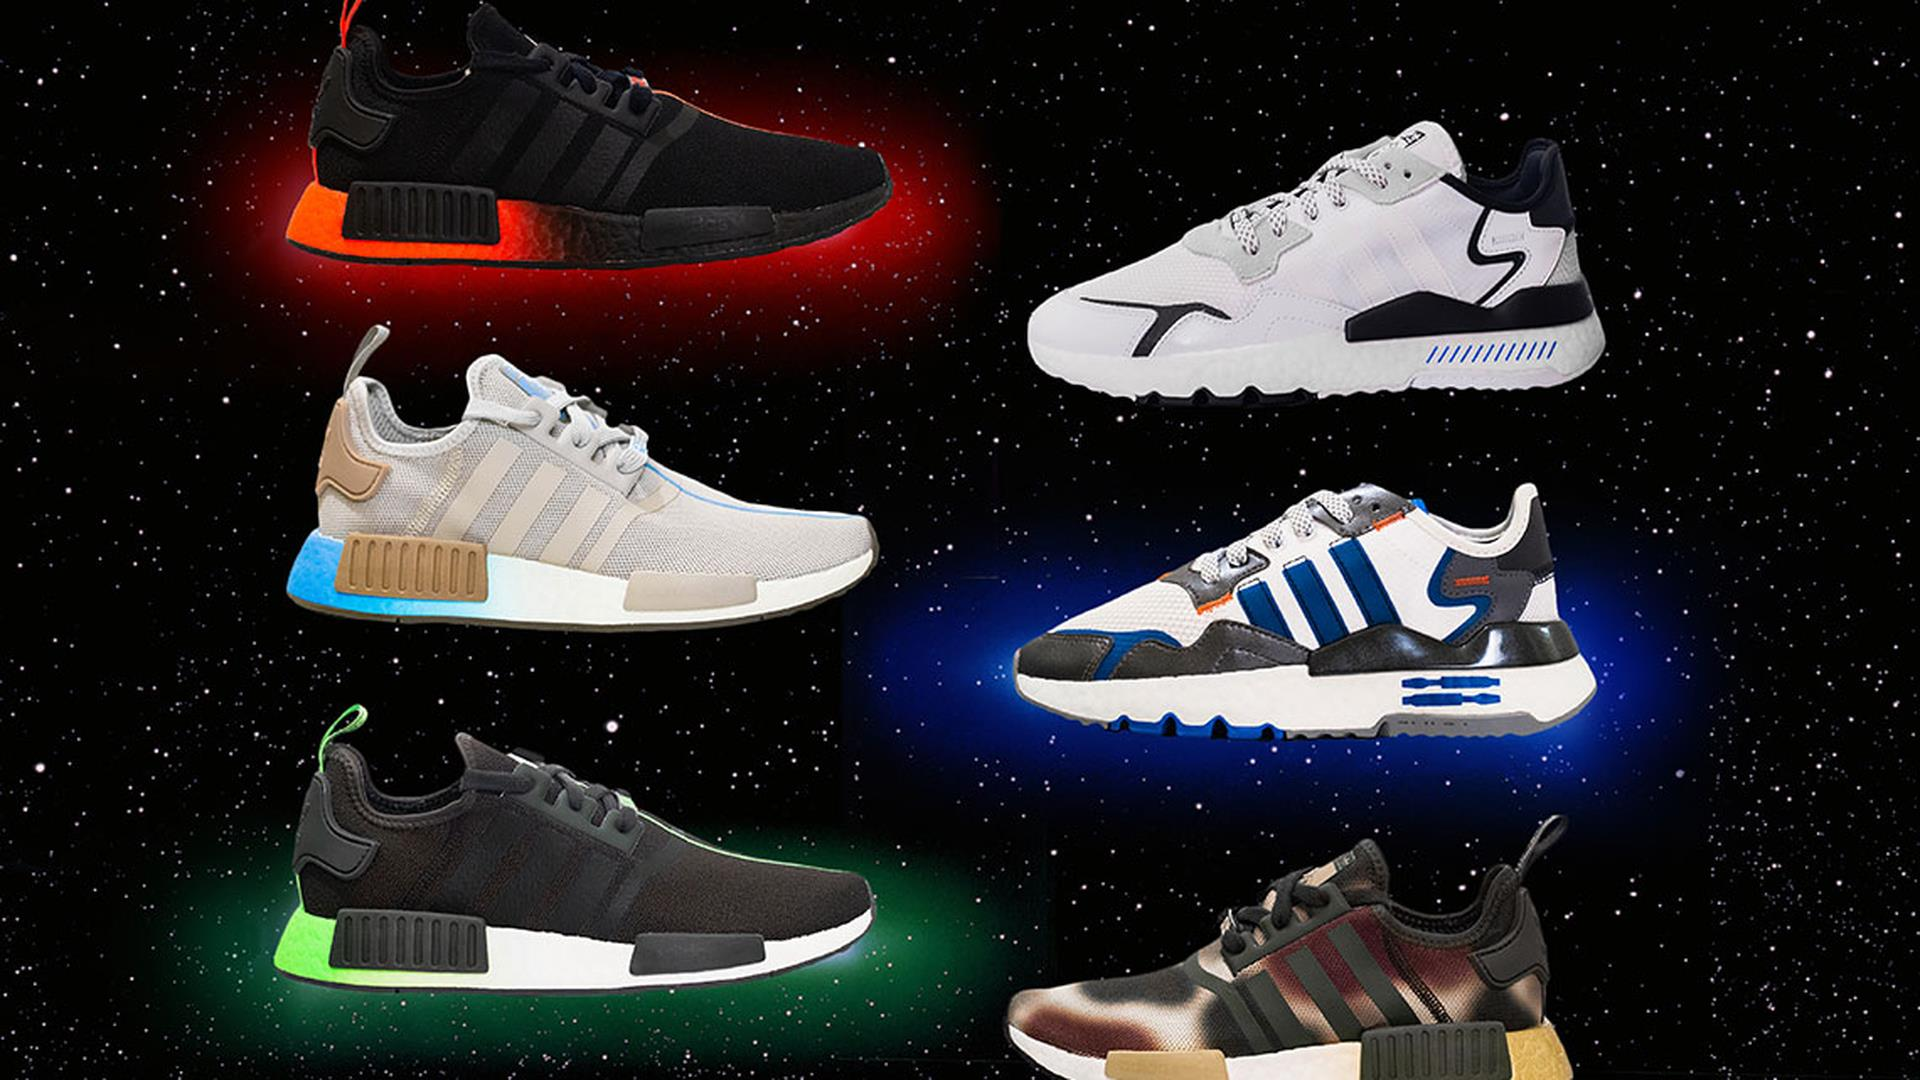 Star Wars x Adidas: le ultime sneakers sono ora disponibili